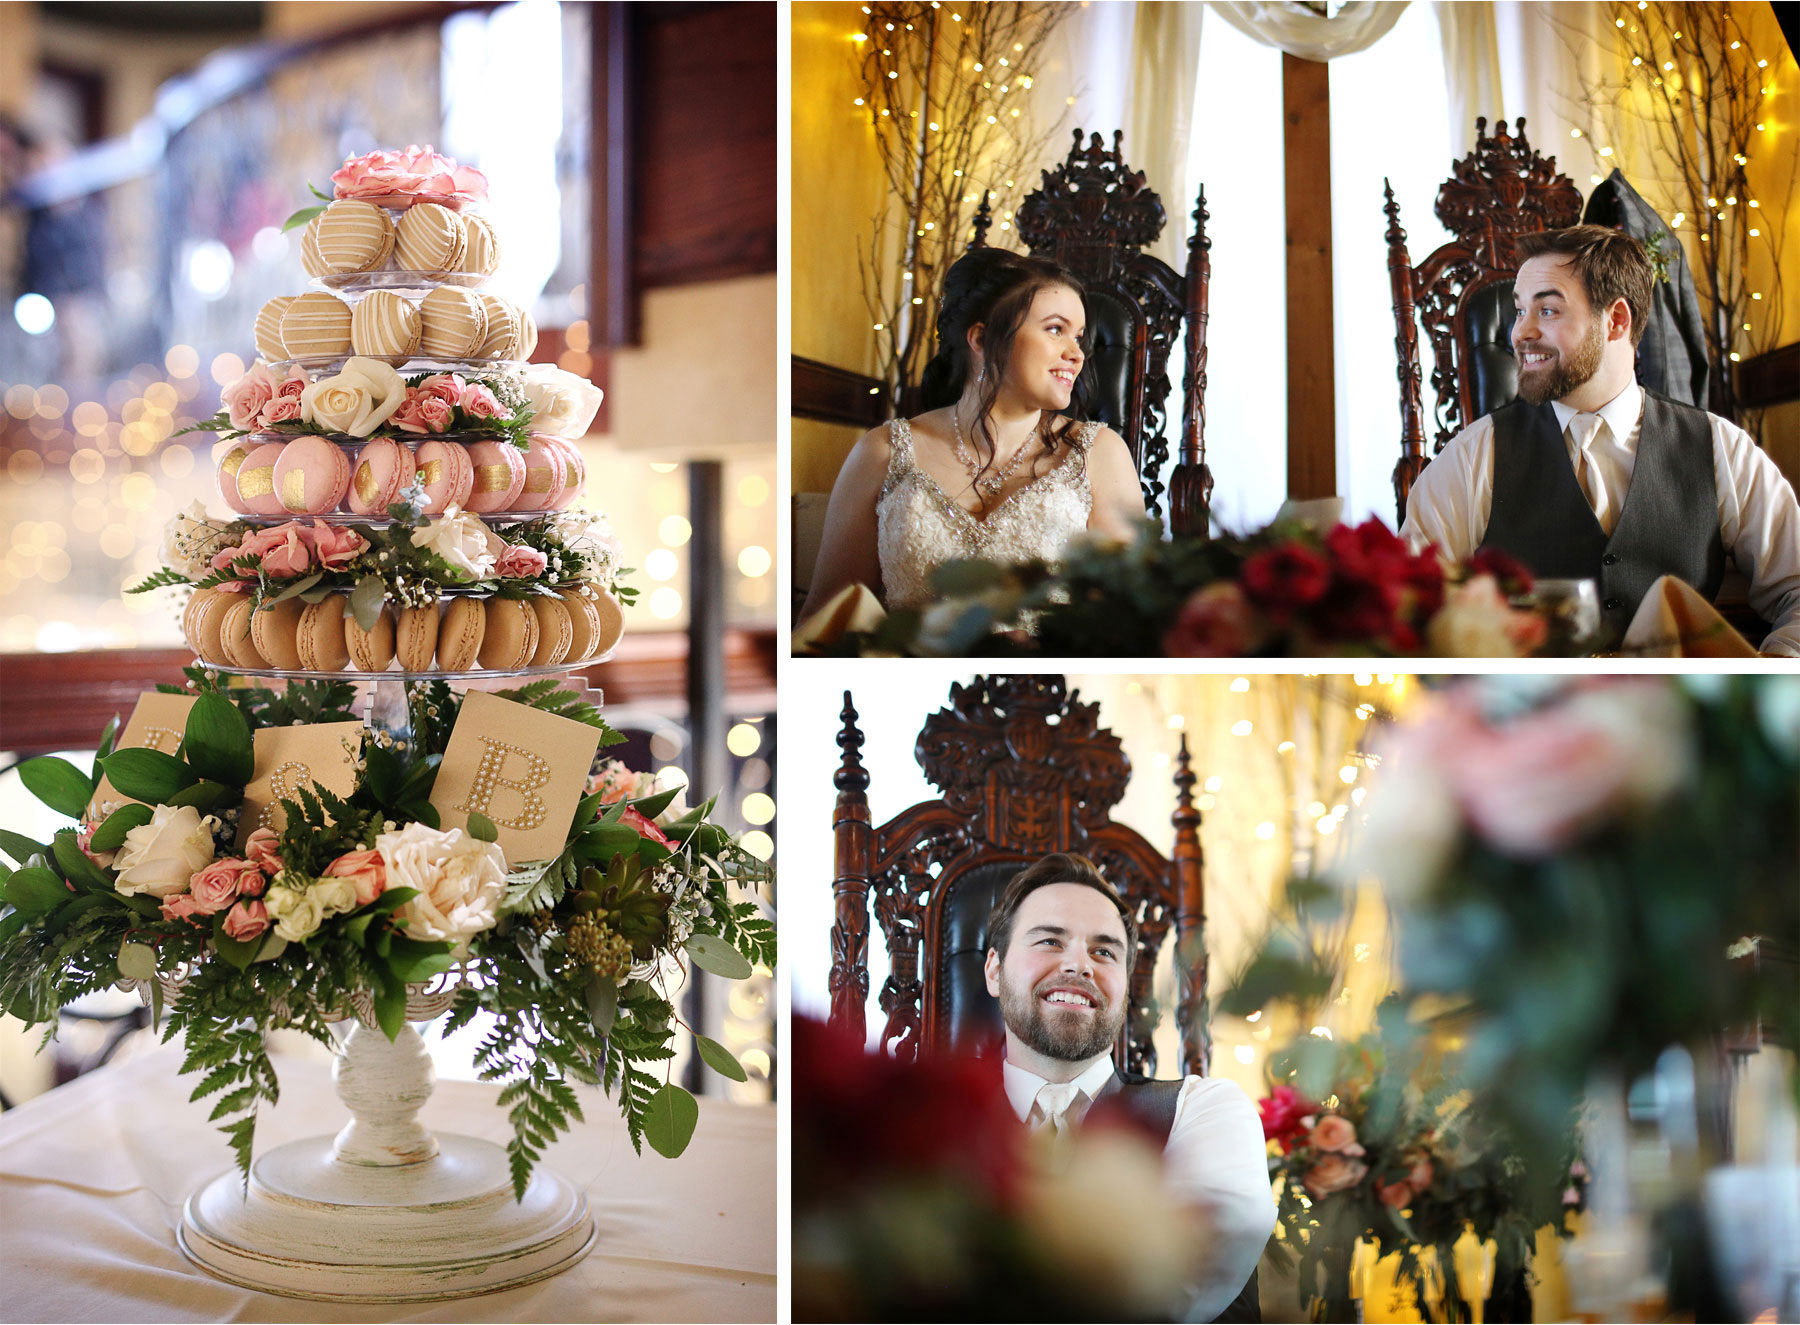 16-Minneapolis-Wedding-Photography-by-Vick-Photography-Historic-Concord-Exchange-Reception-Macaroon-Cake-Rachael-and-Benjamin.jpg